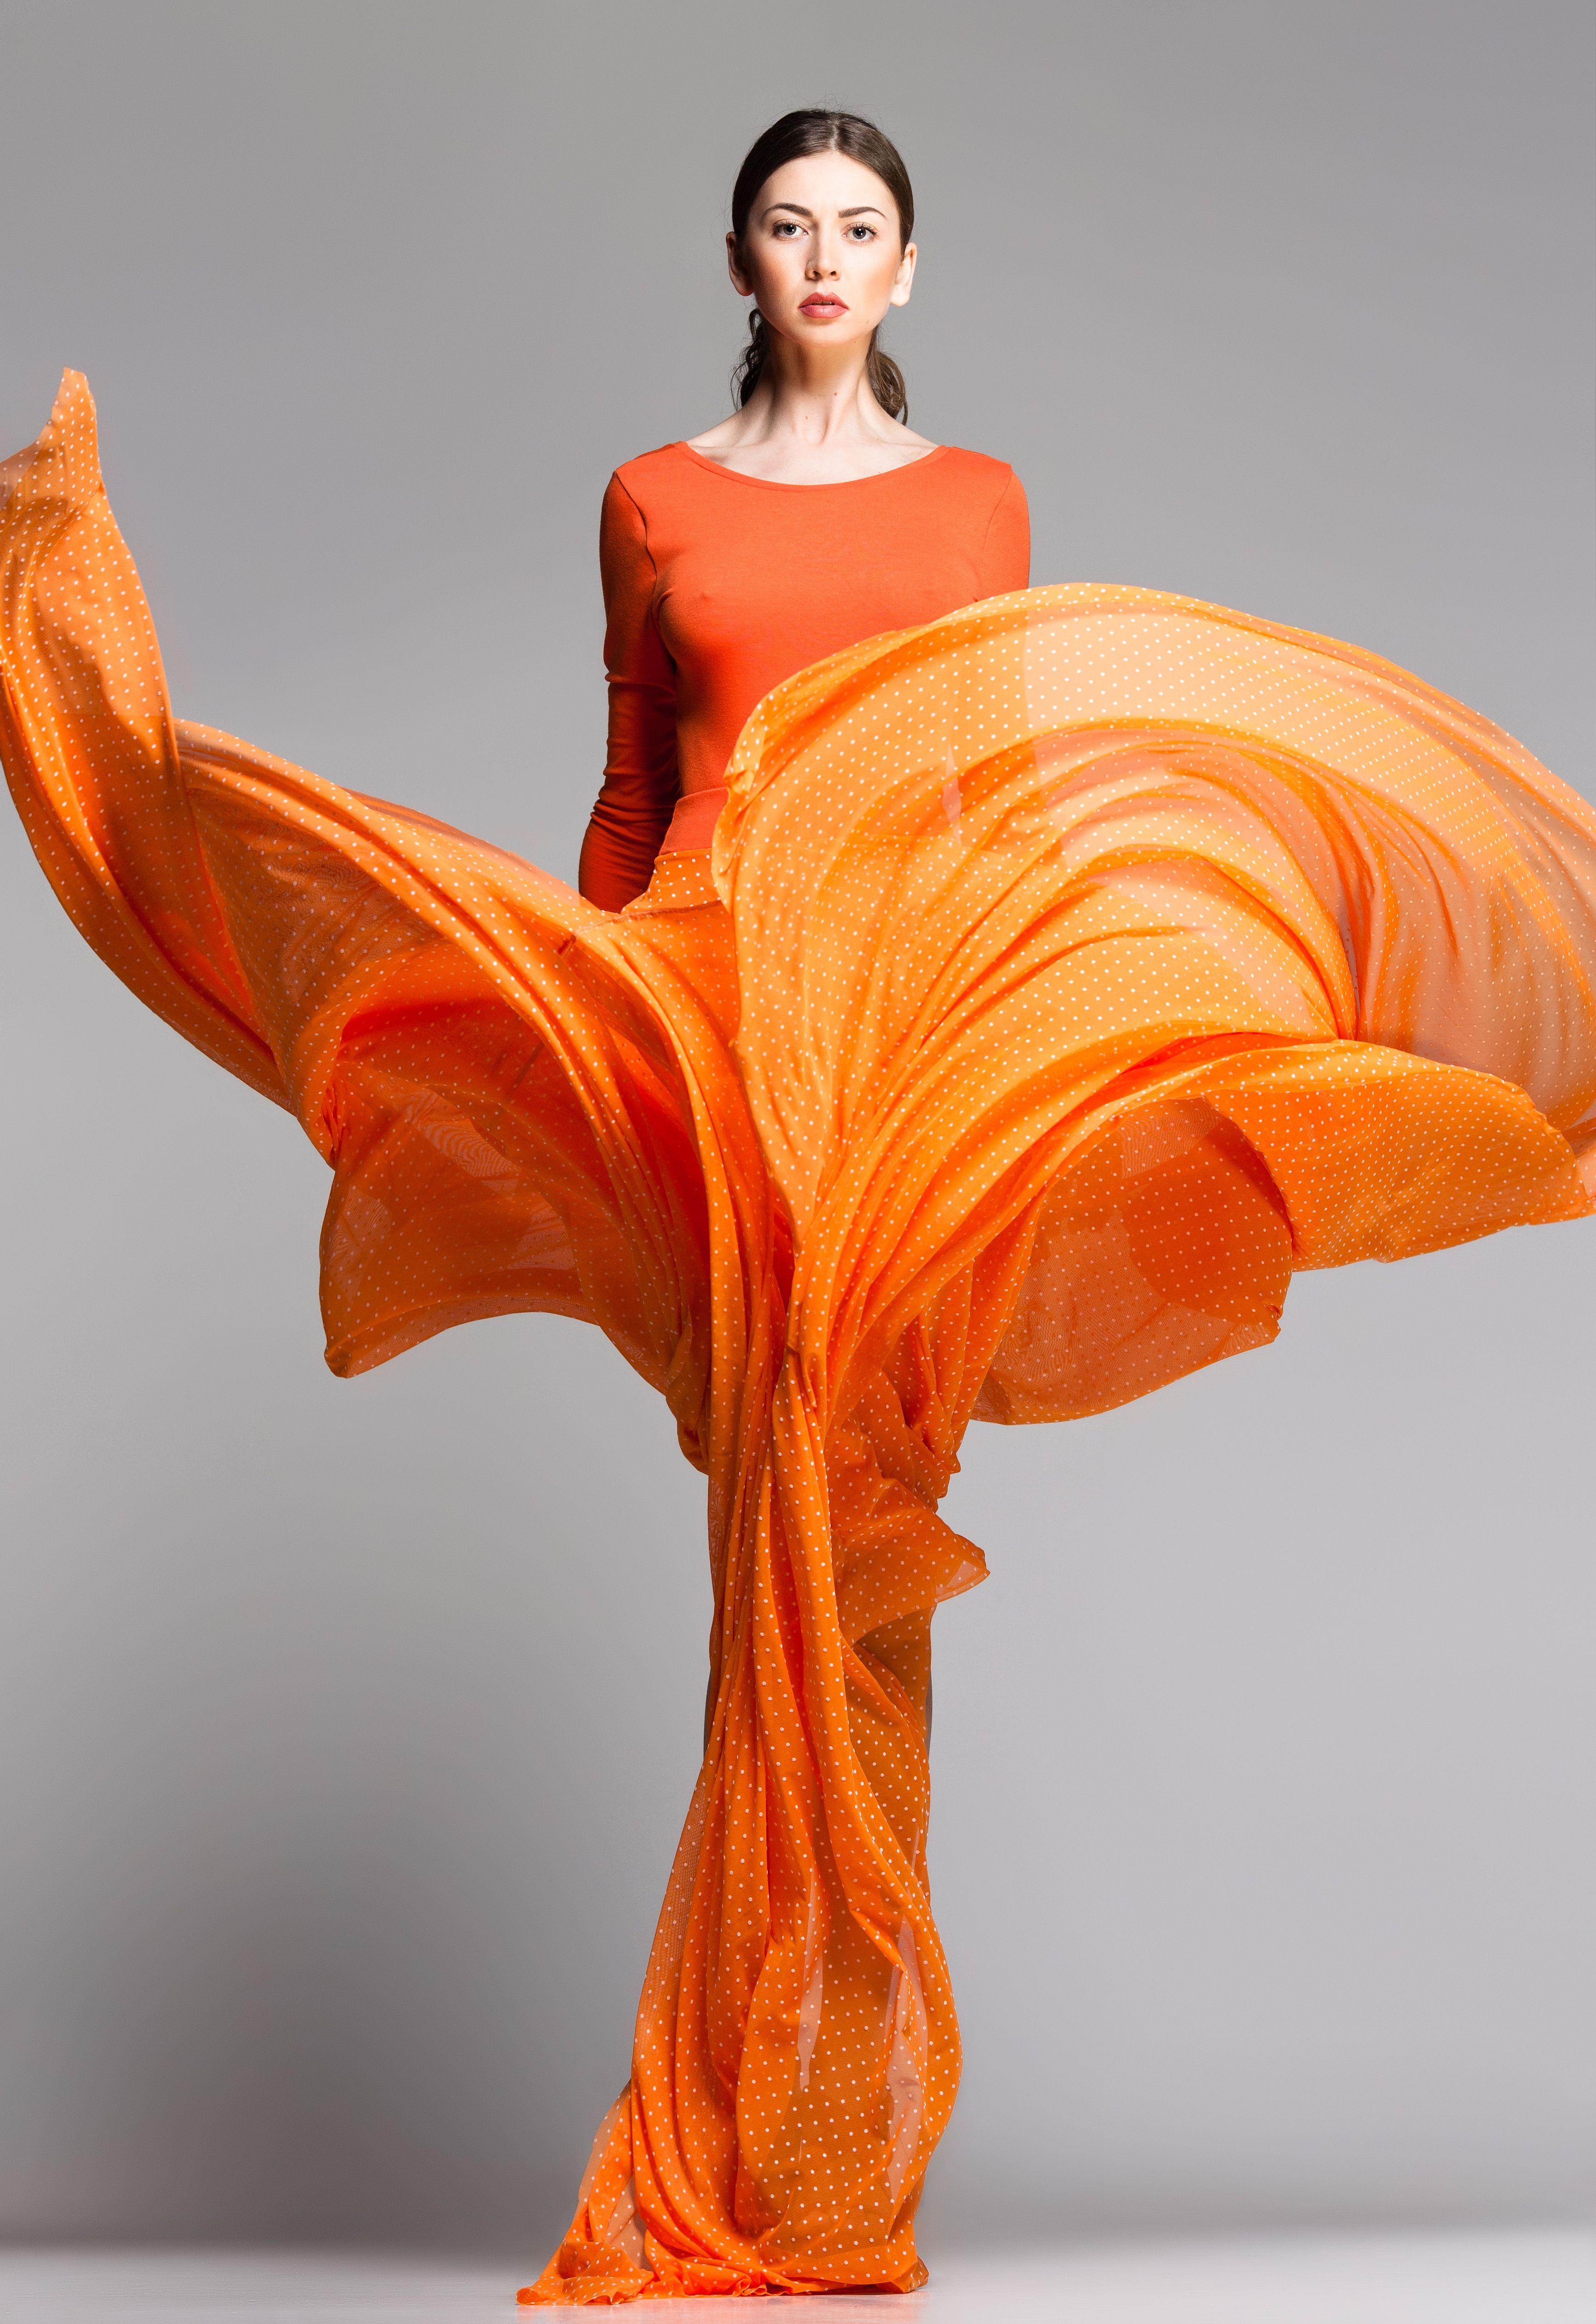 Orange Model Management Inc: Photography: Matusciac; Model: Claudia Marusanici; Fashion